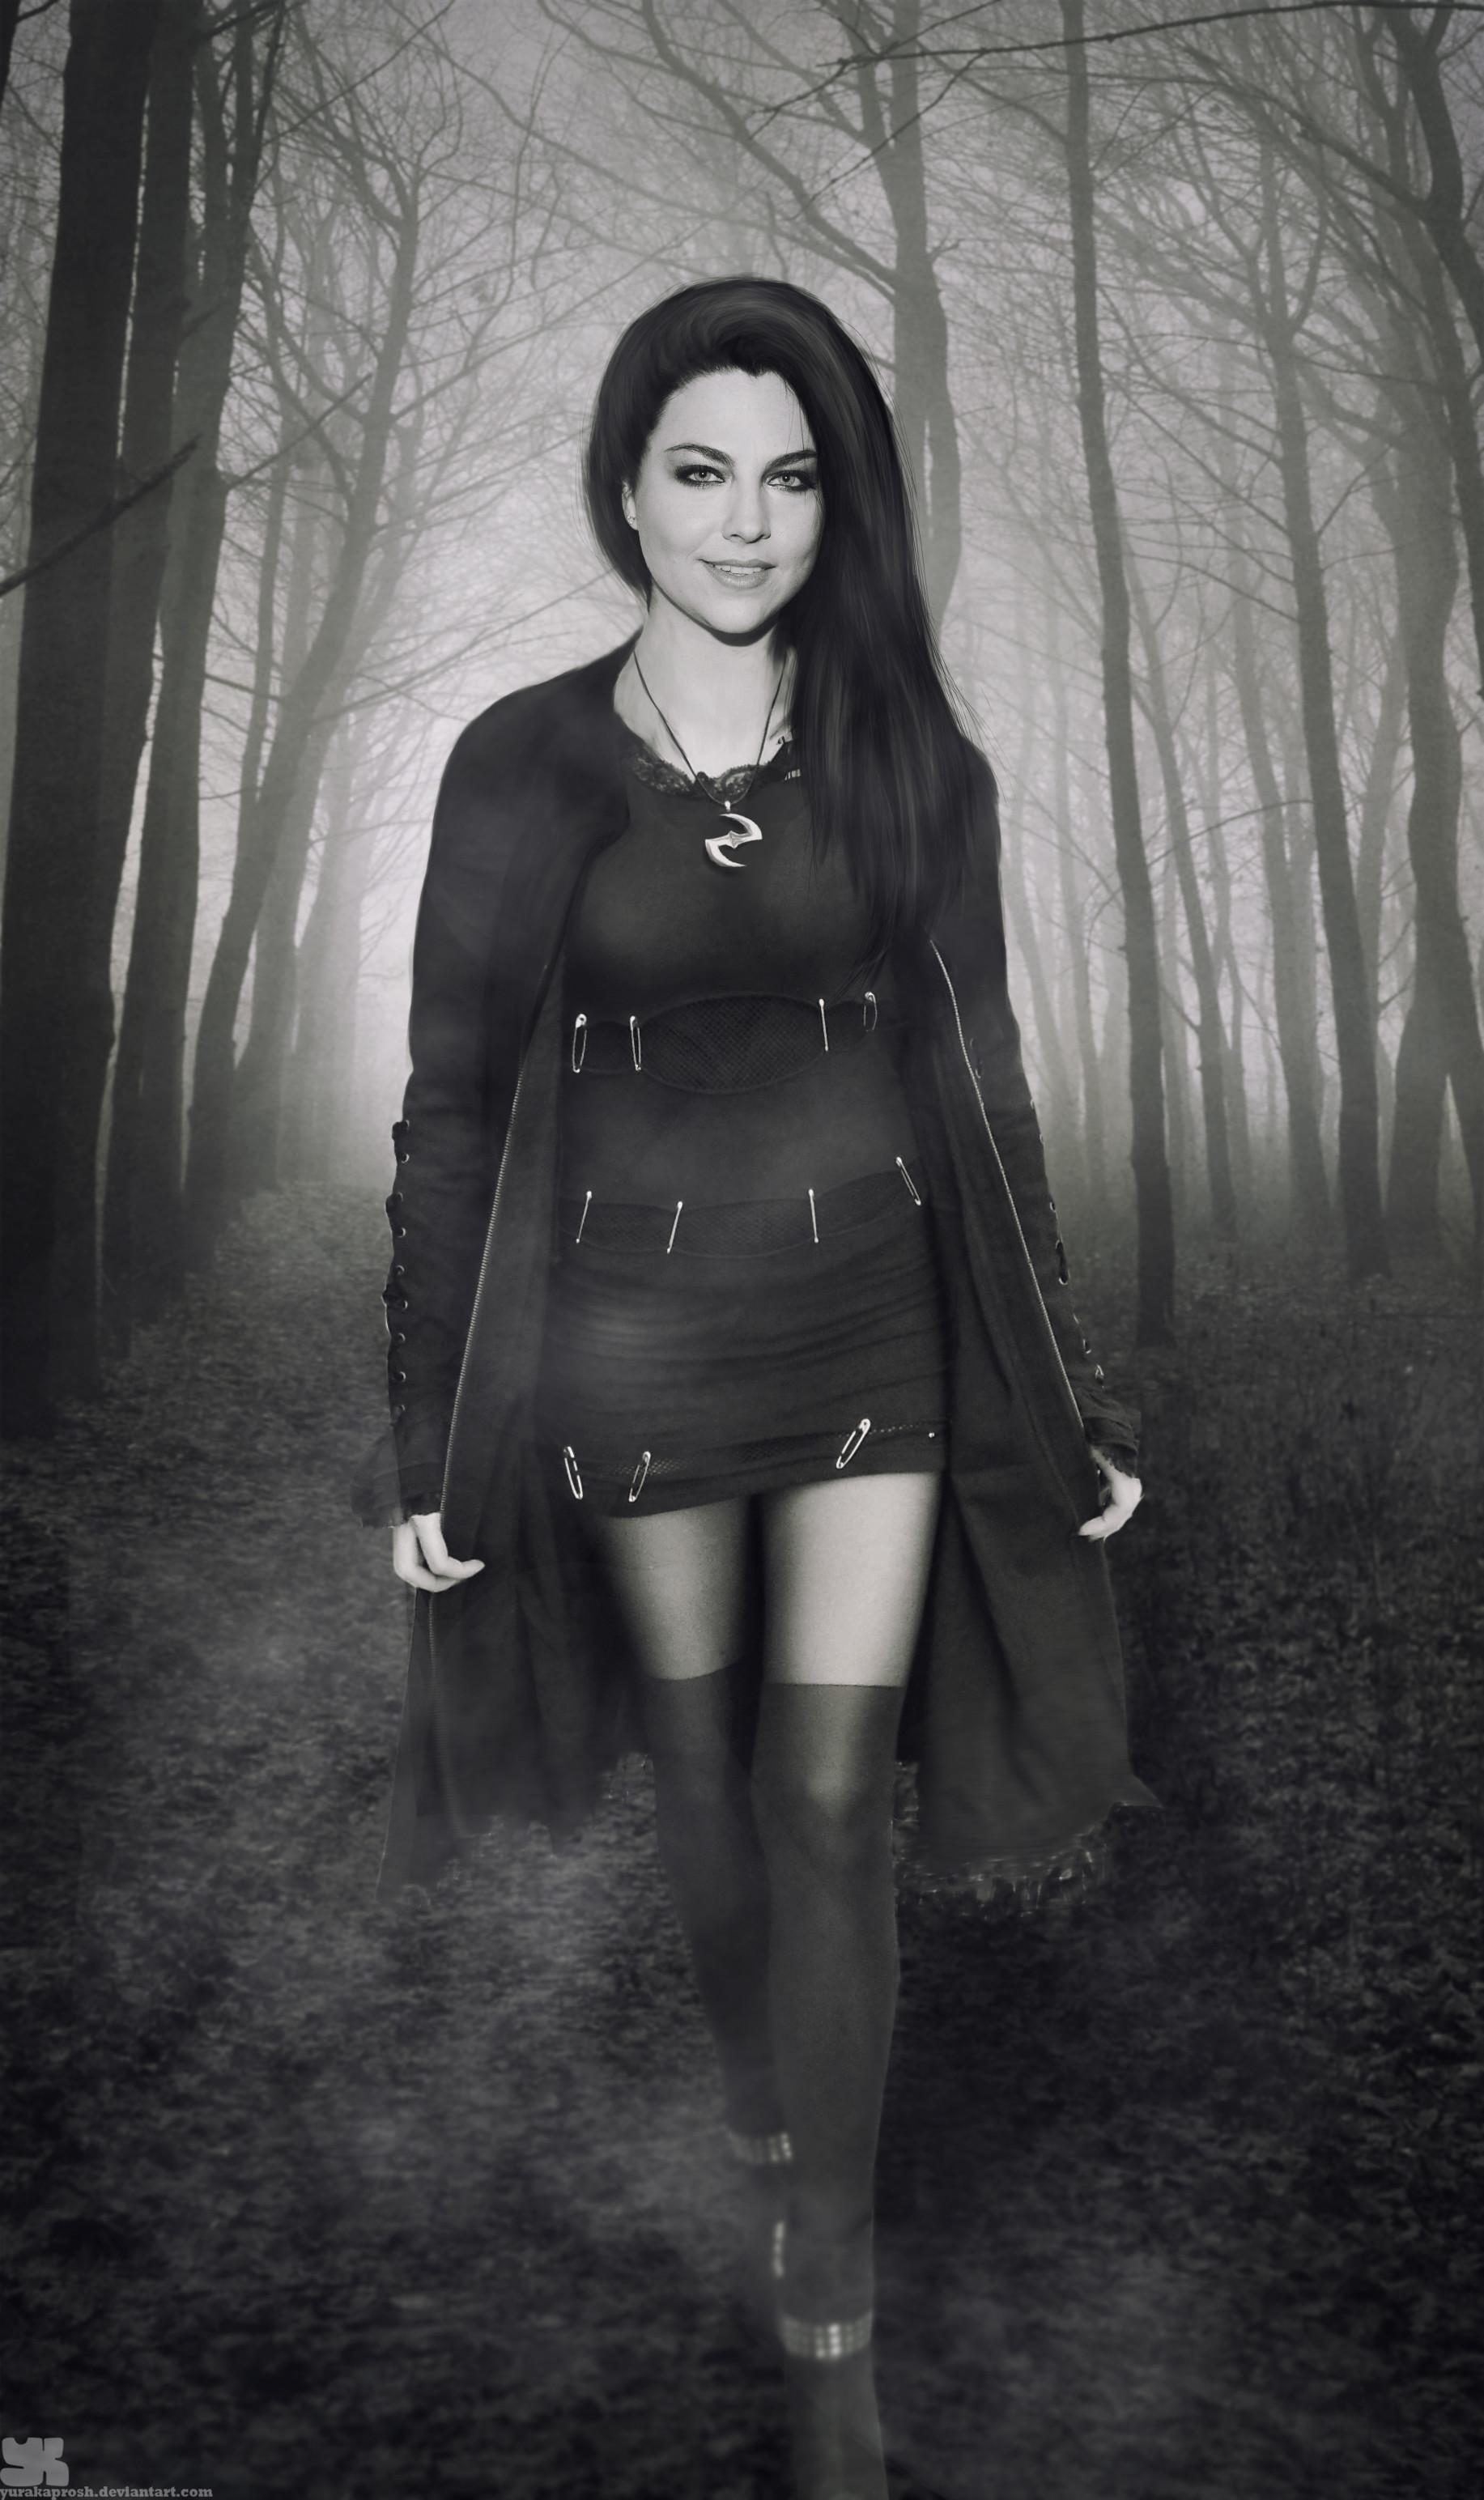 Amy Lee by YuraKaprosh Amy Lee by YuraKaprosh